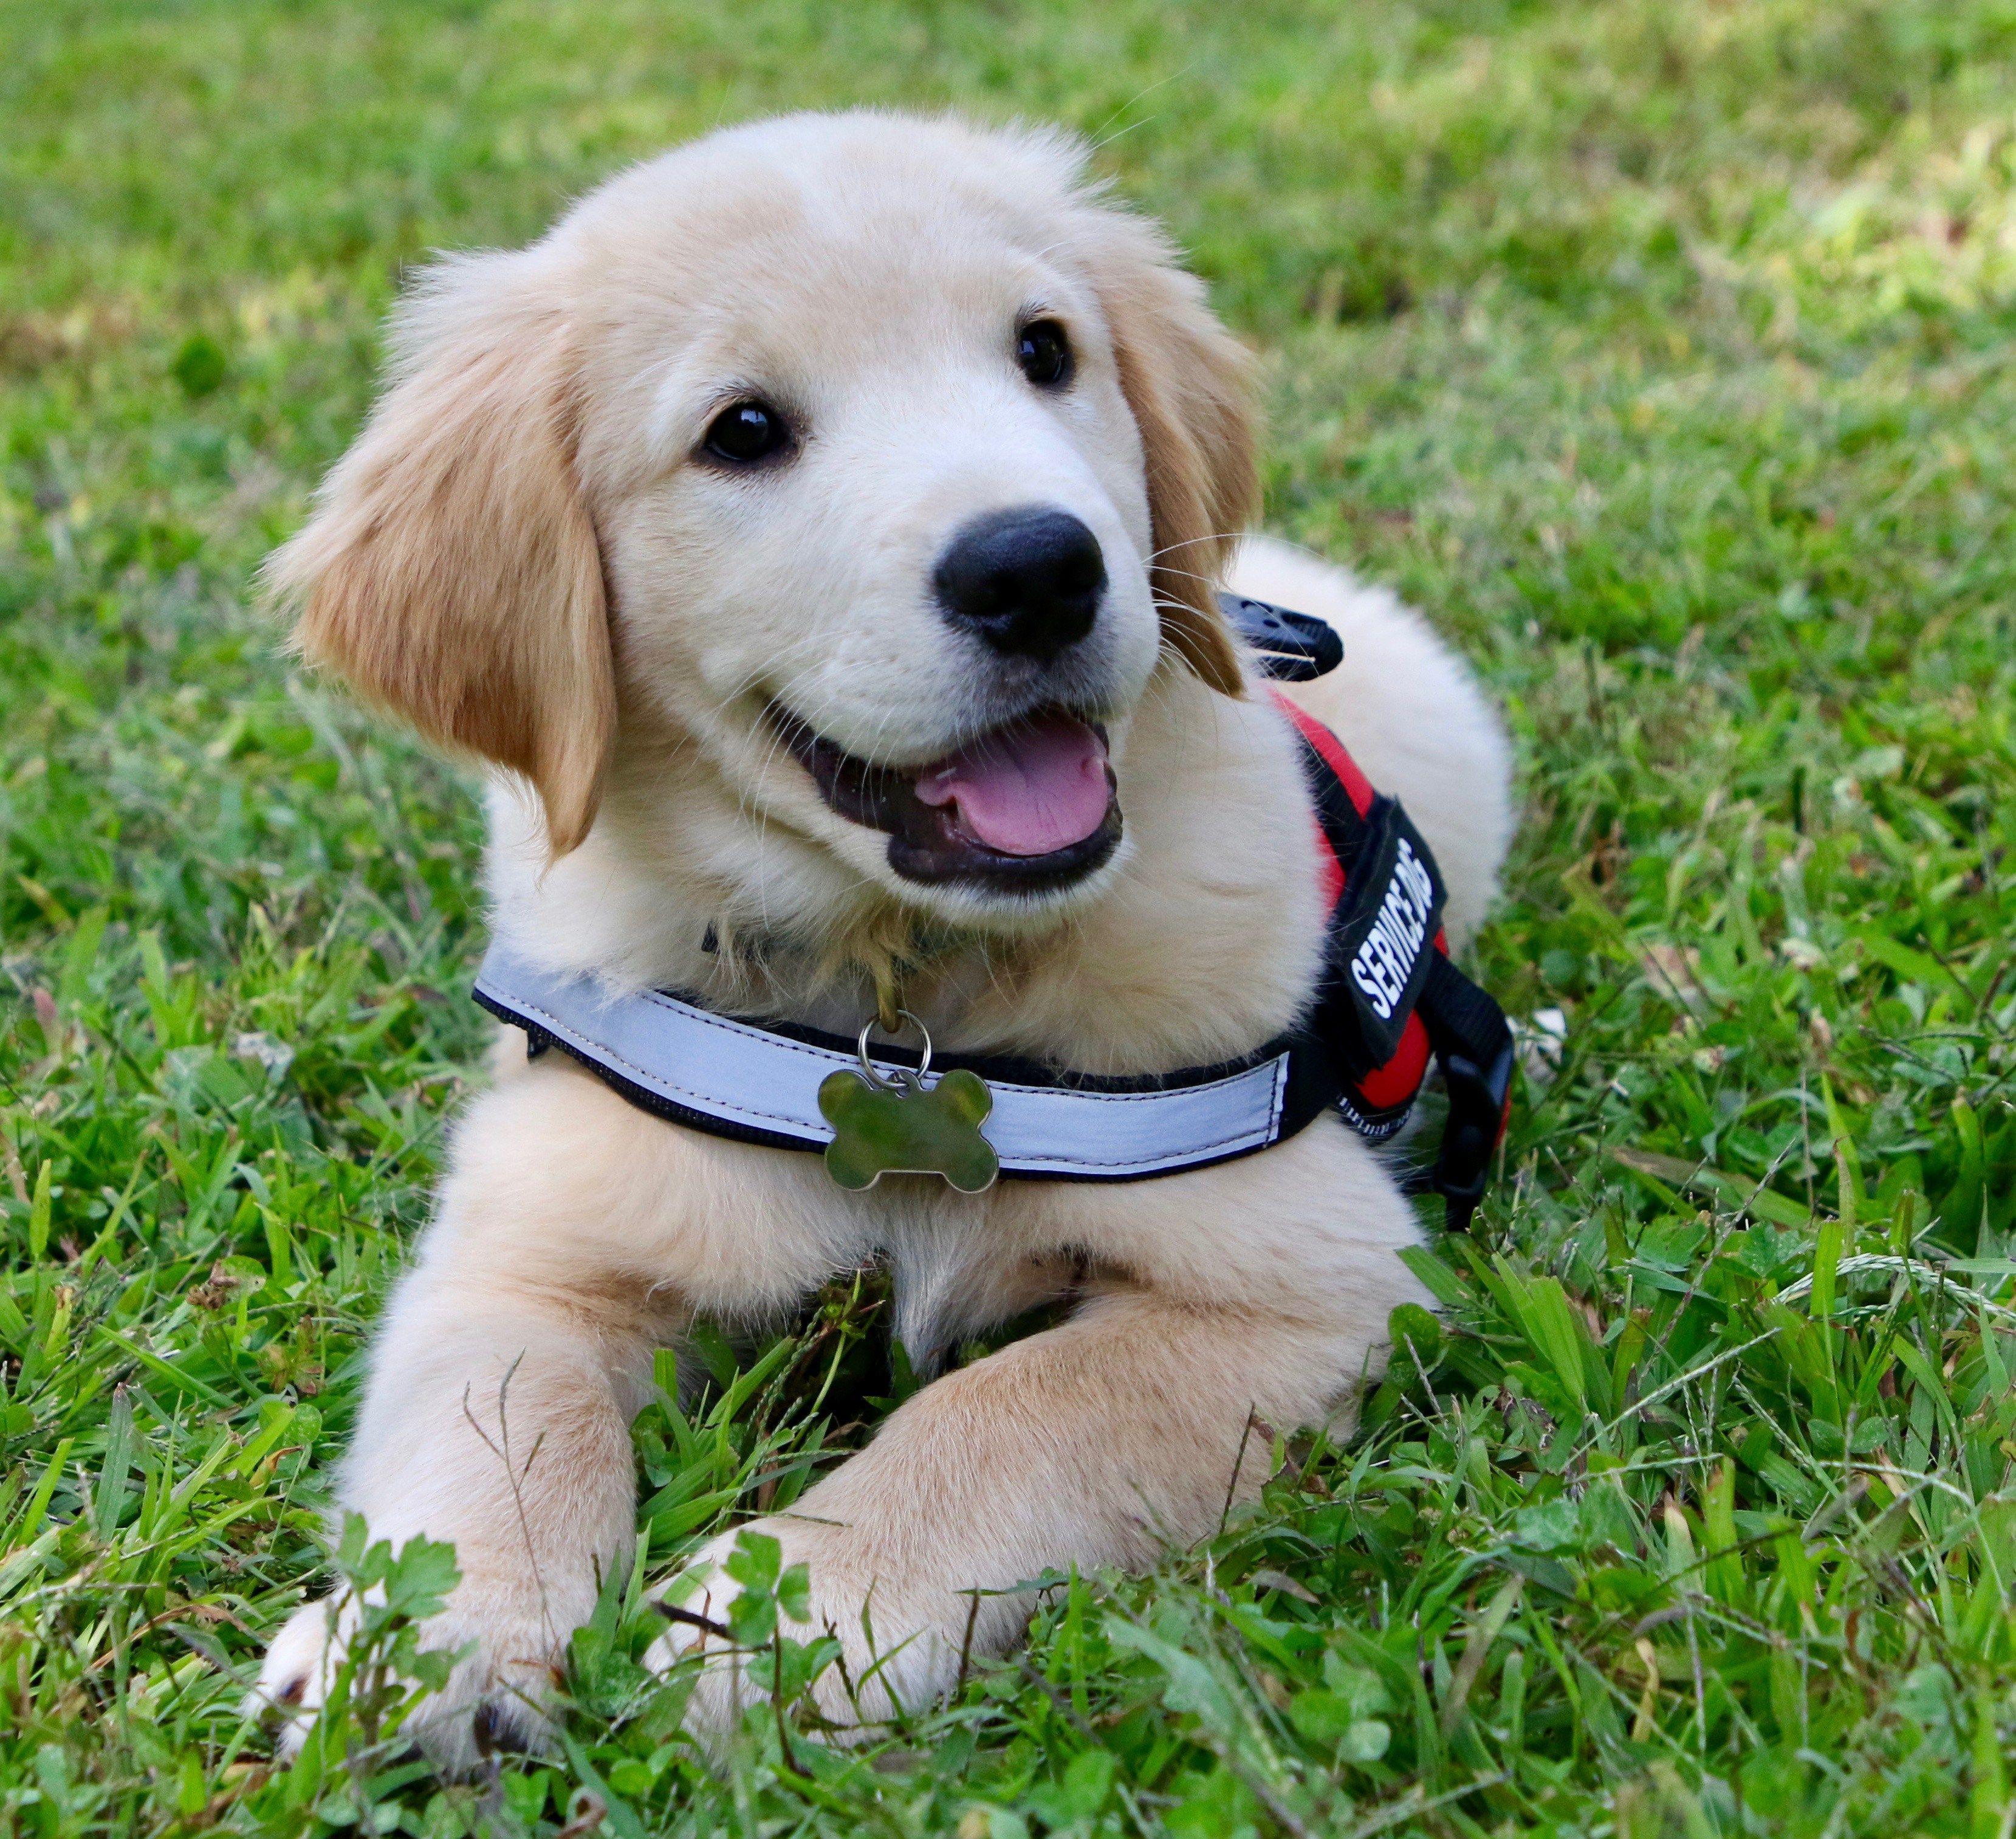 Cute Dog Service Dog Training Service Dogs Dog Training